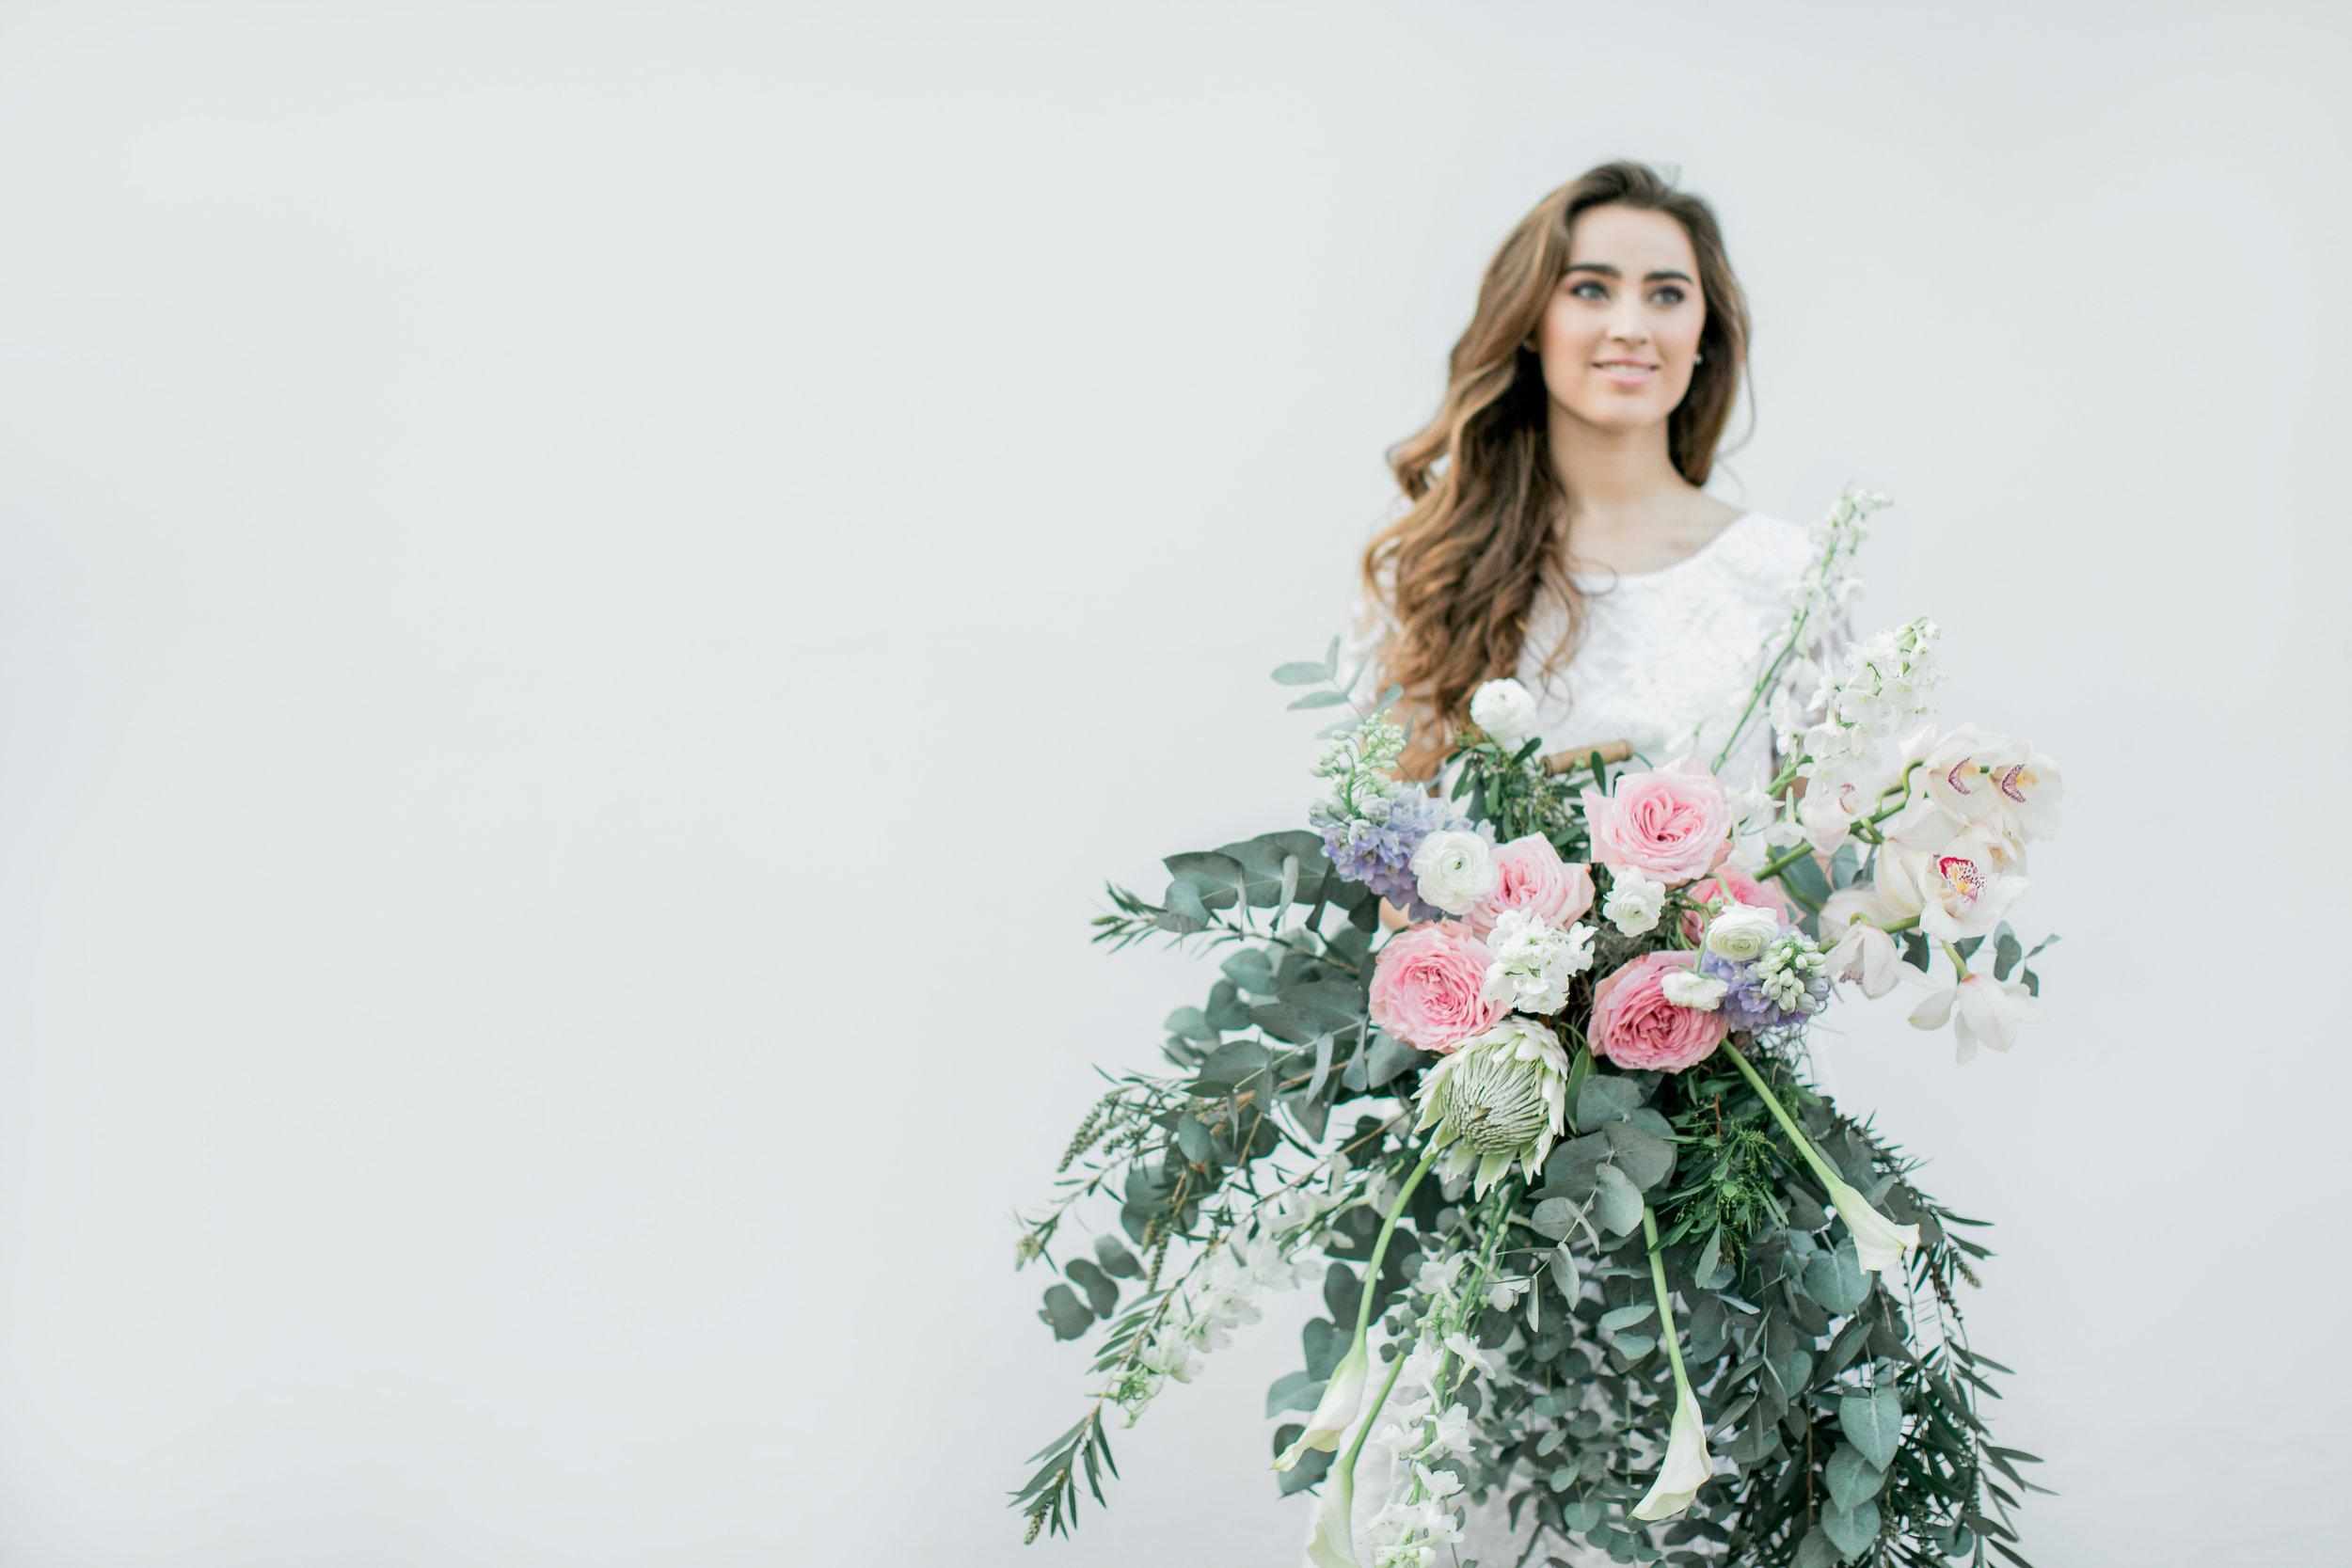 gauteng wedding photographer clareece smit18.jpg